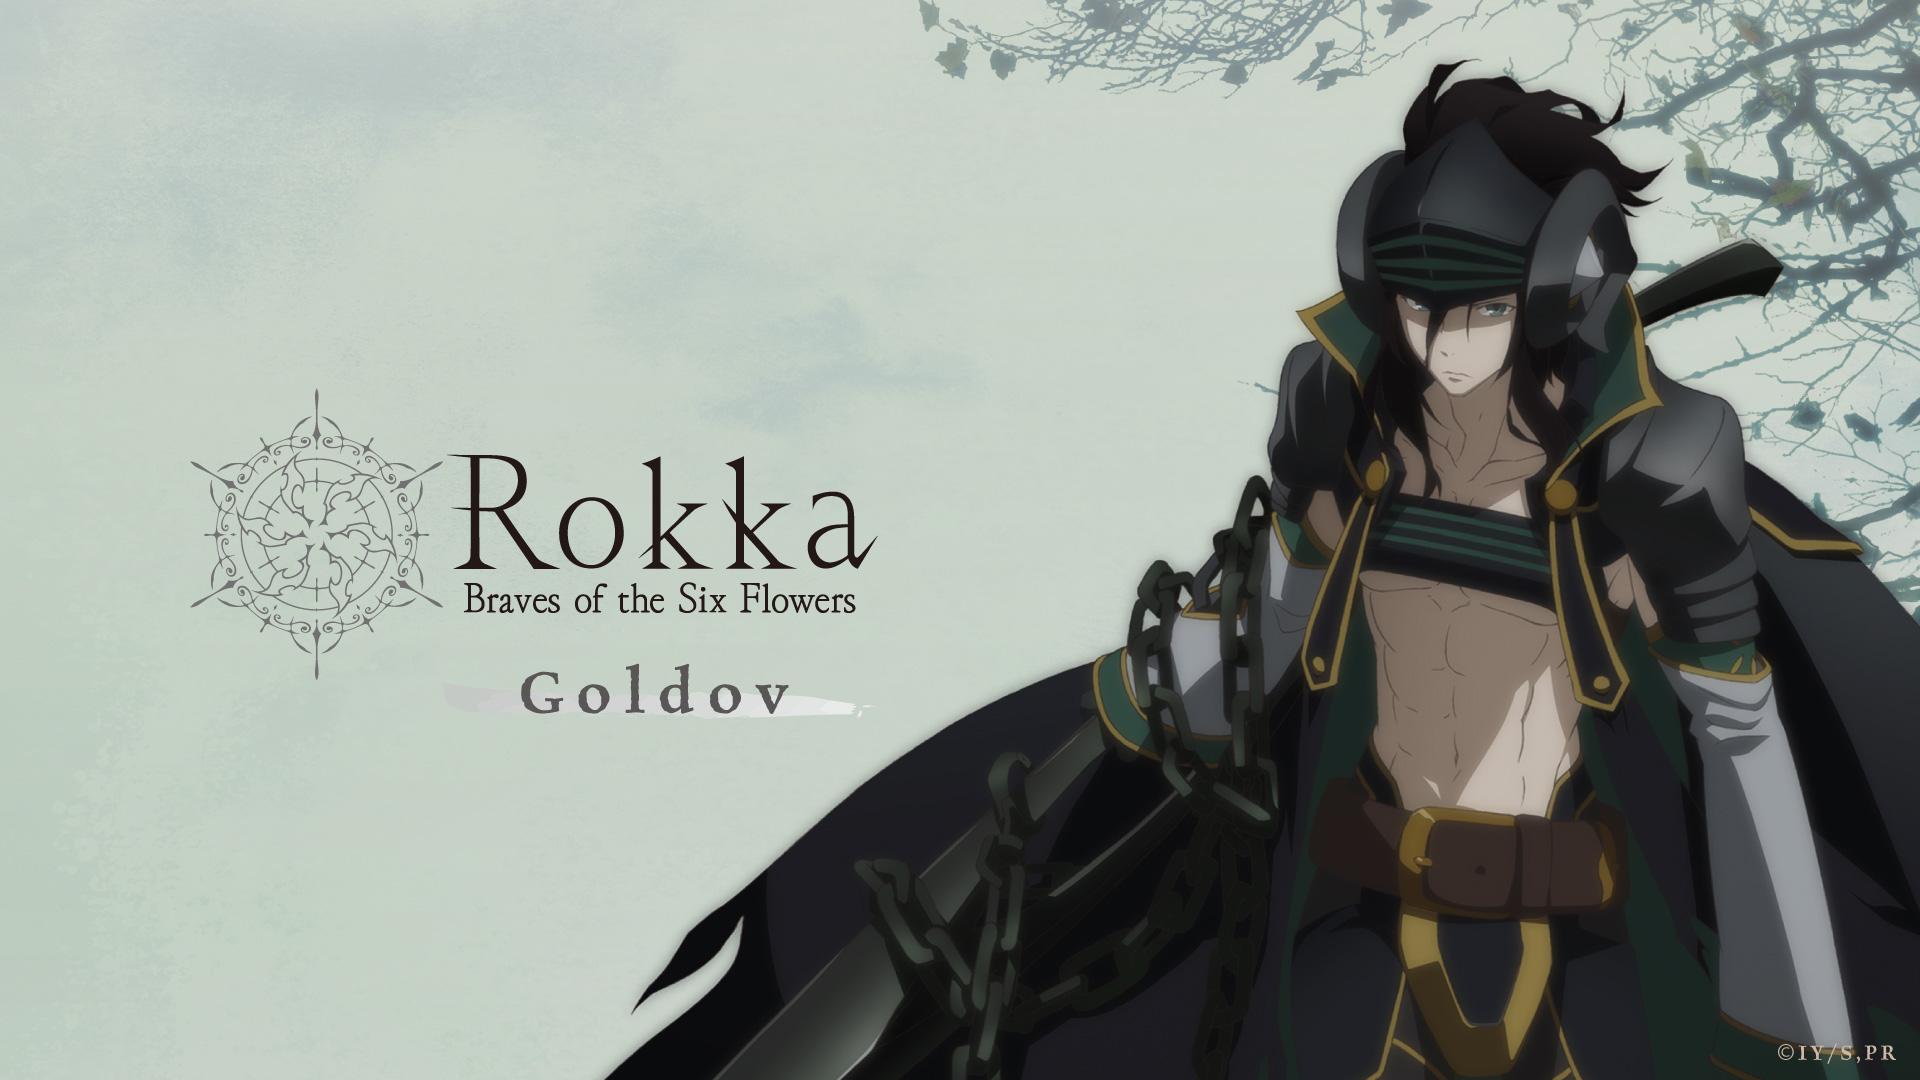 Rokka-no-Yuusha-Anime-Wallpaper-Goldov-Auora